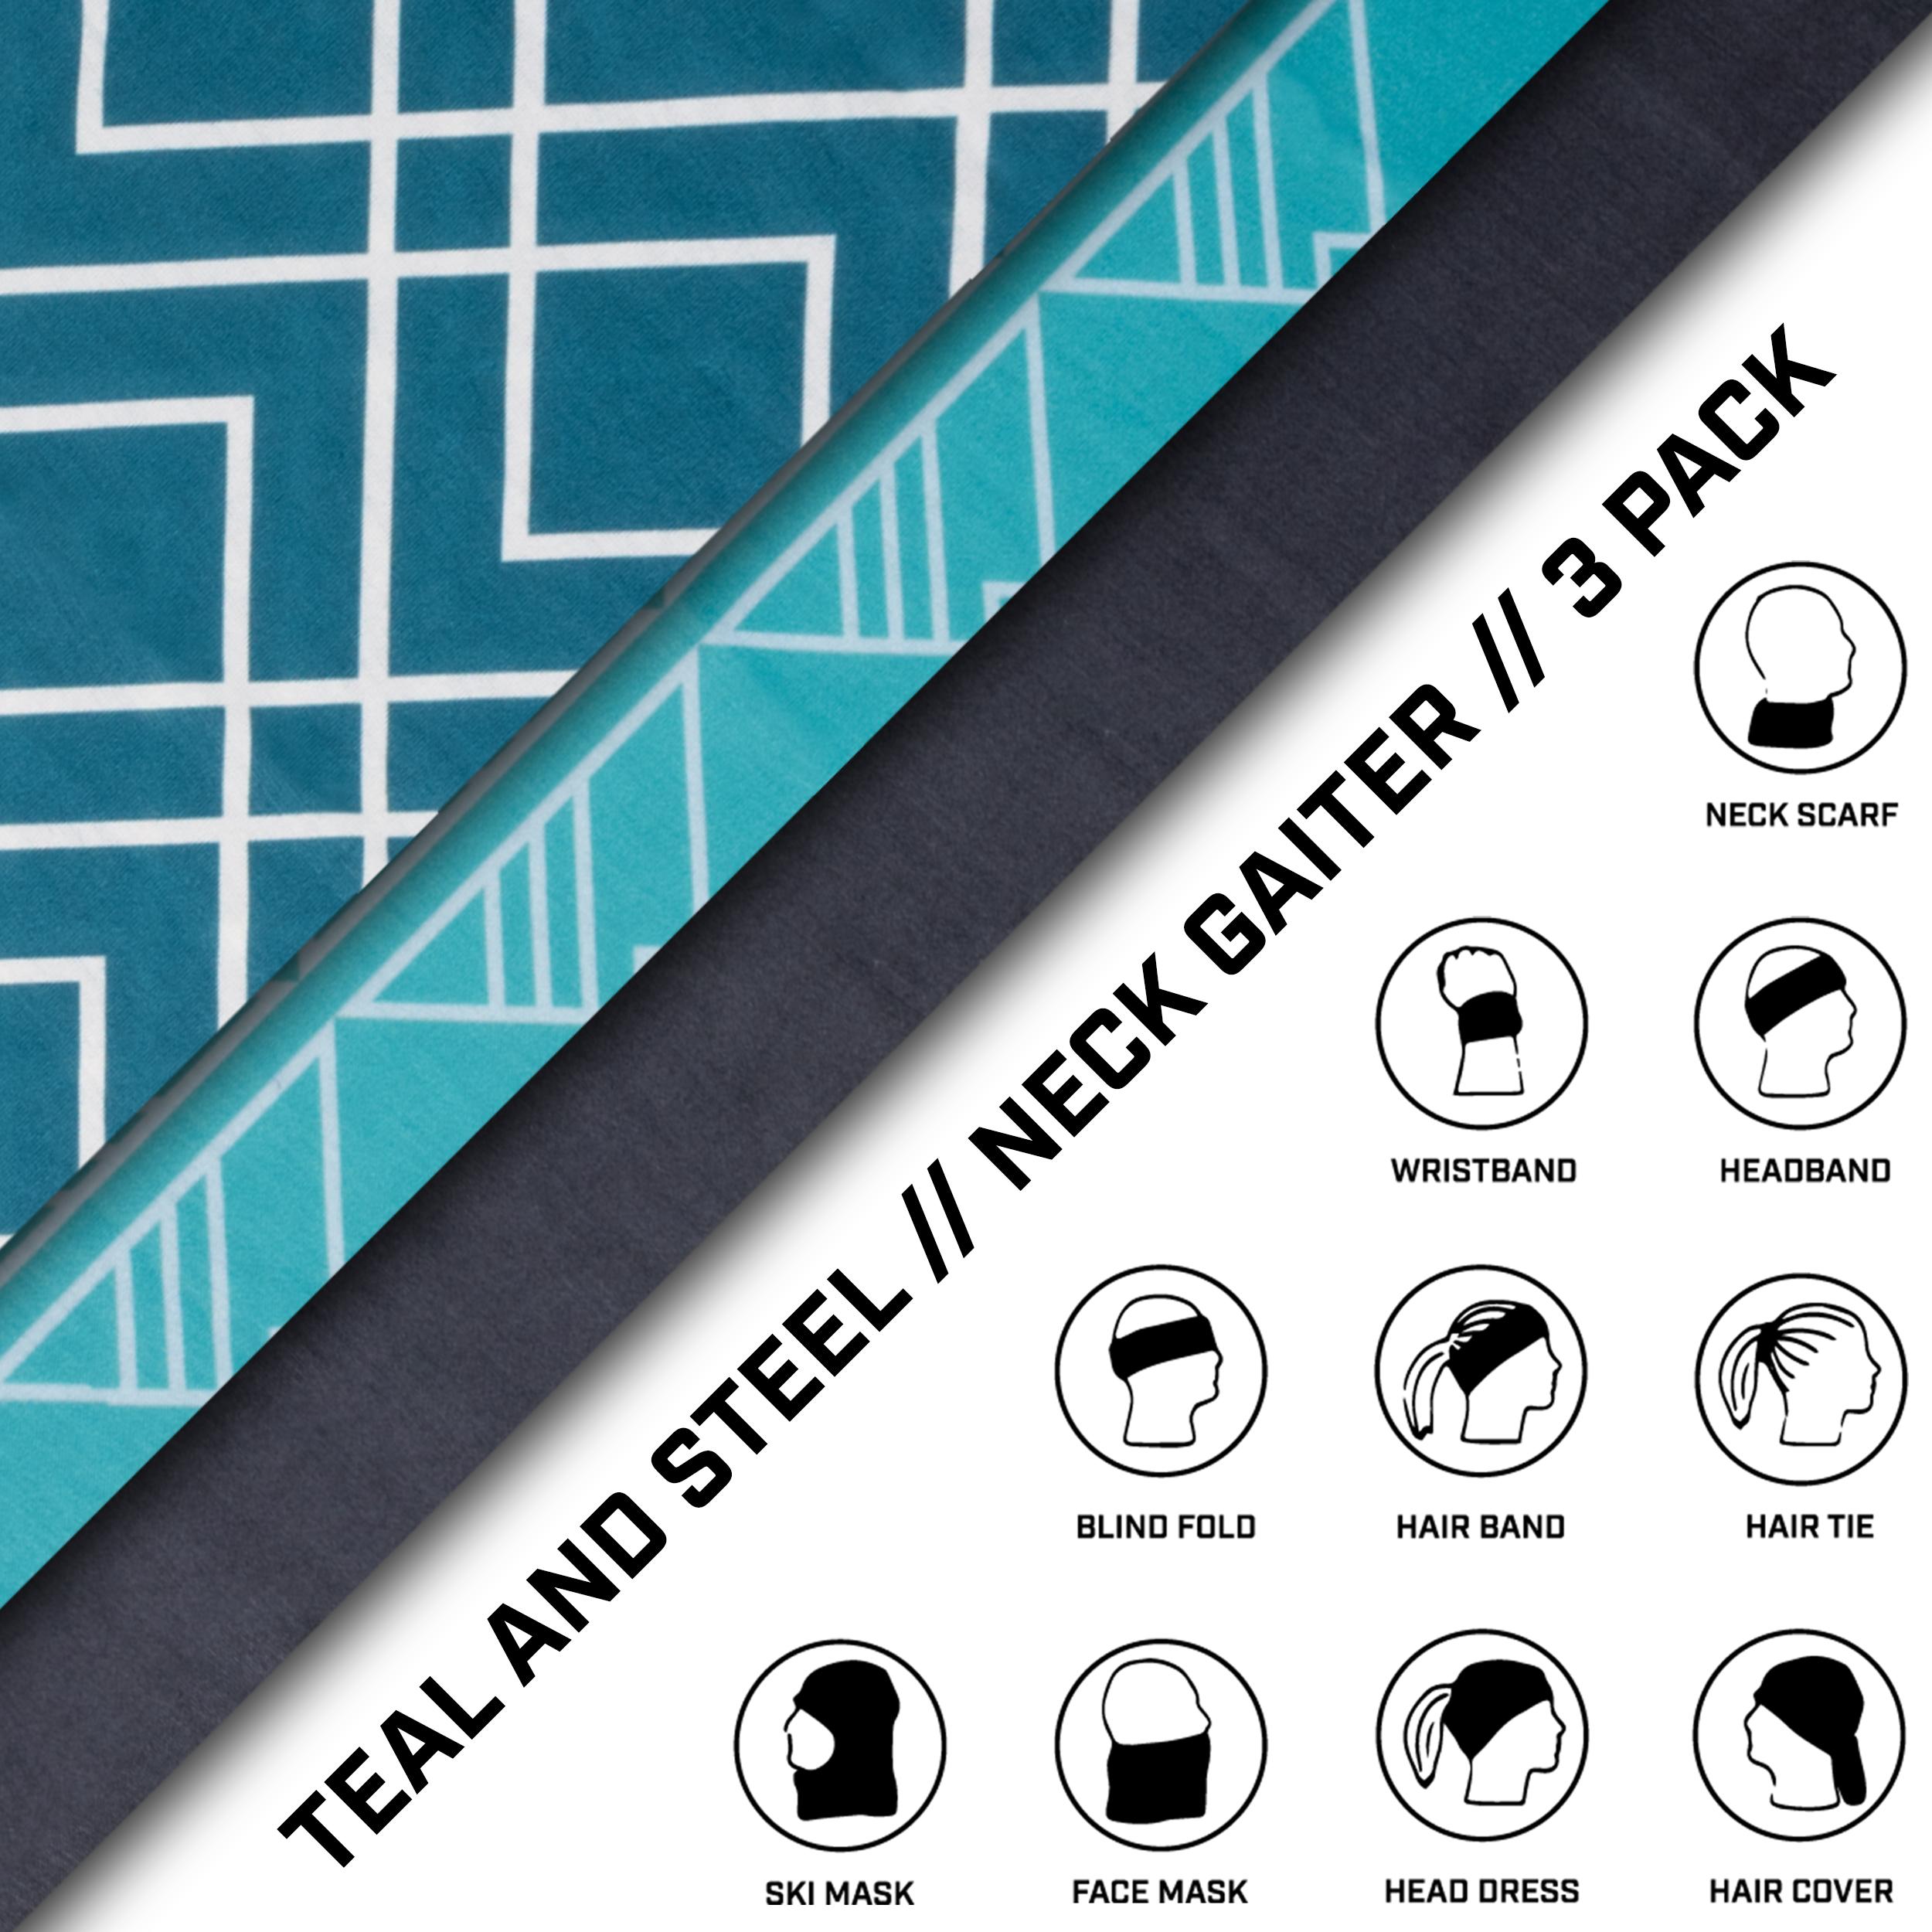 Neck Gaiter 3 Pack - Teal & Steel